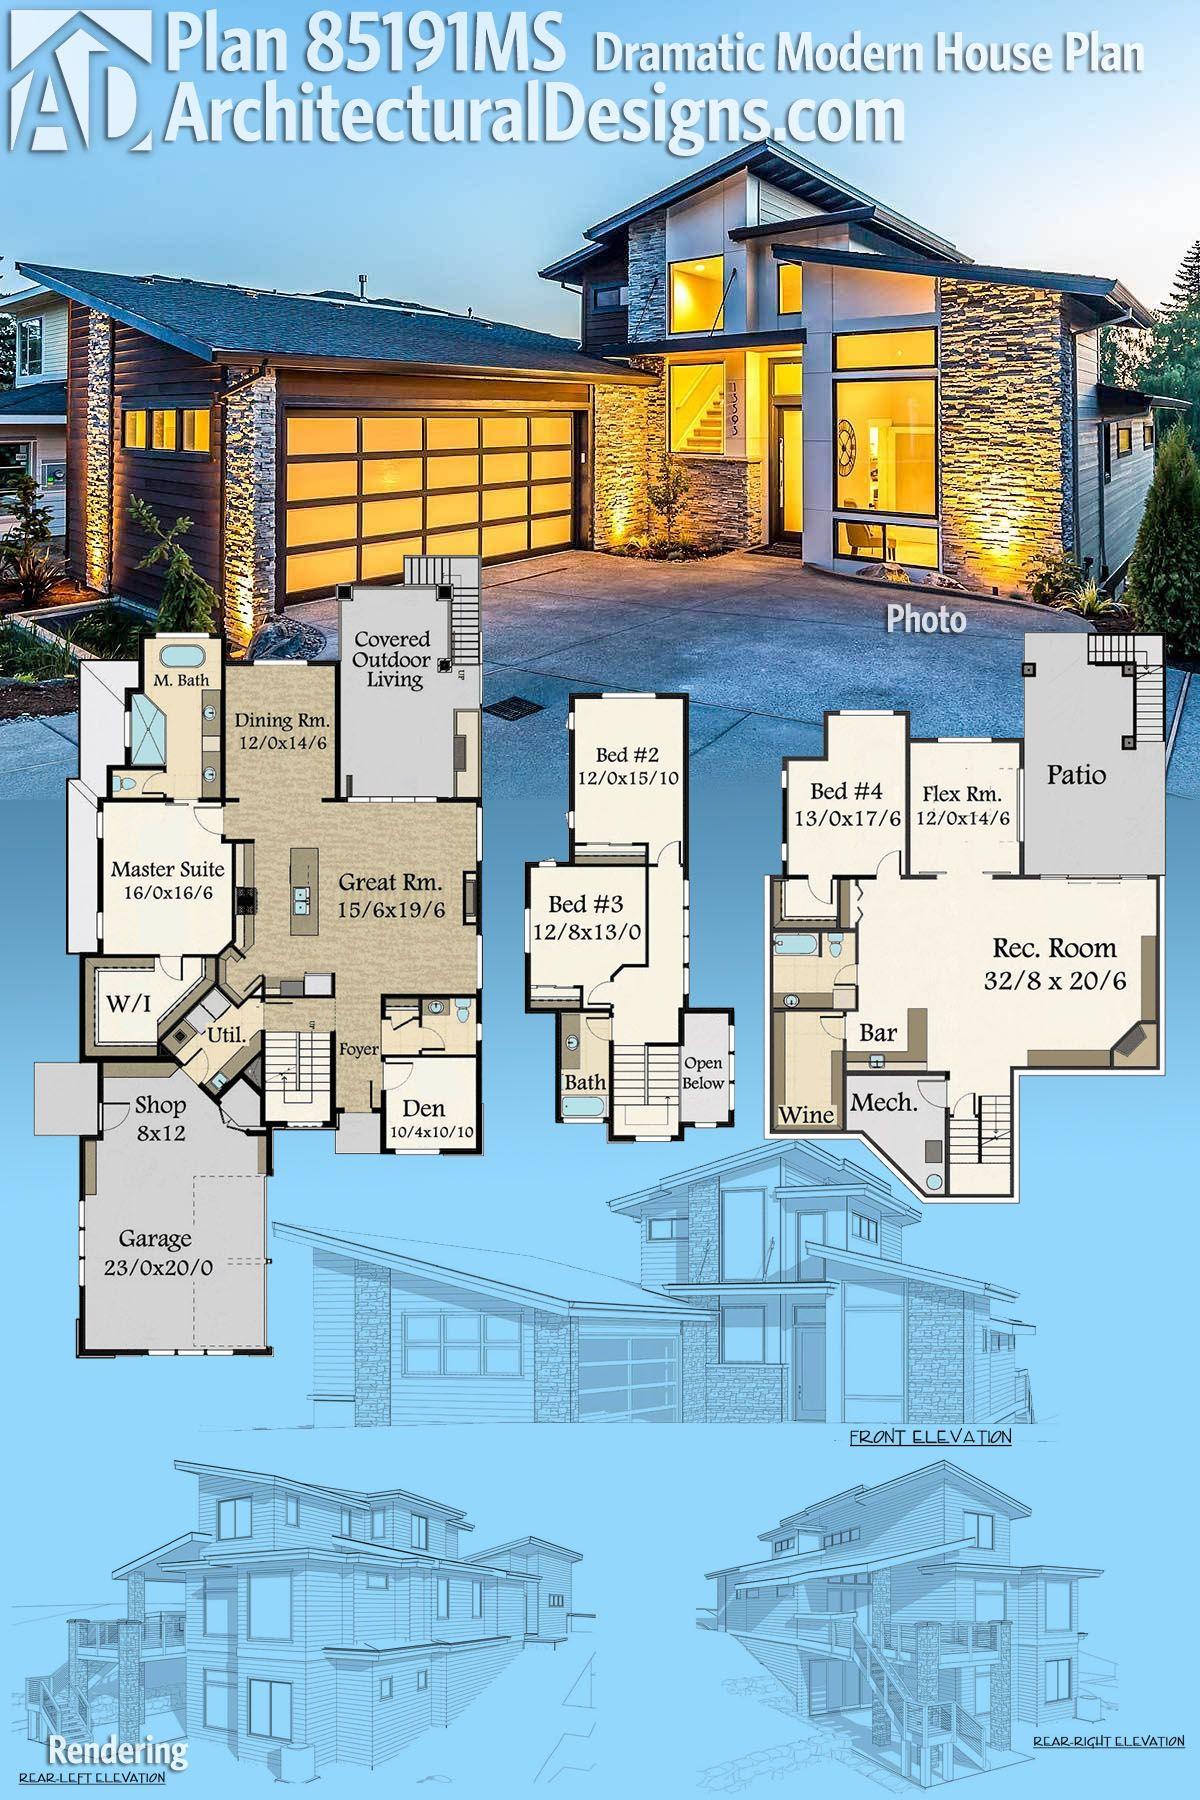 Plan ms dramatic modern house plan house pinterest house